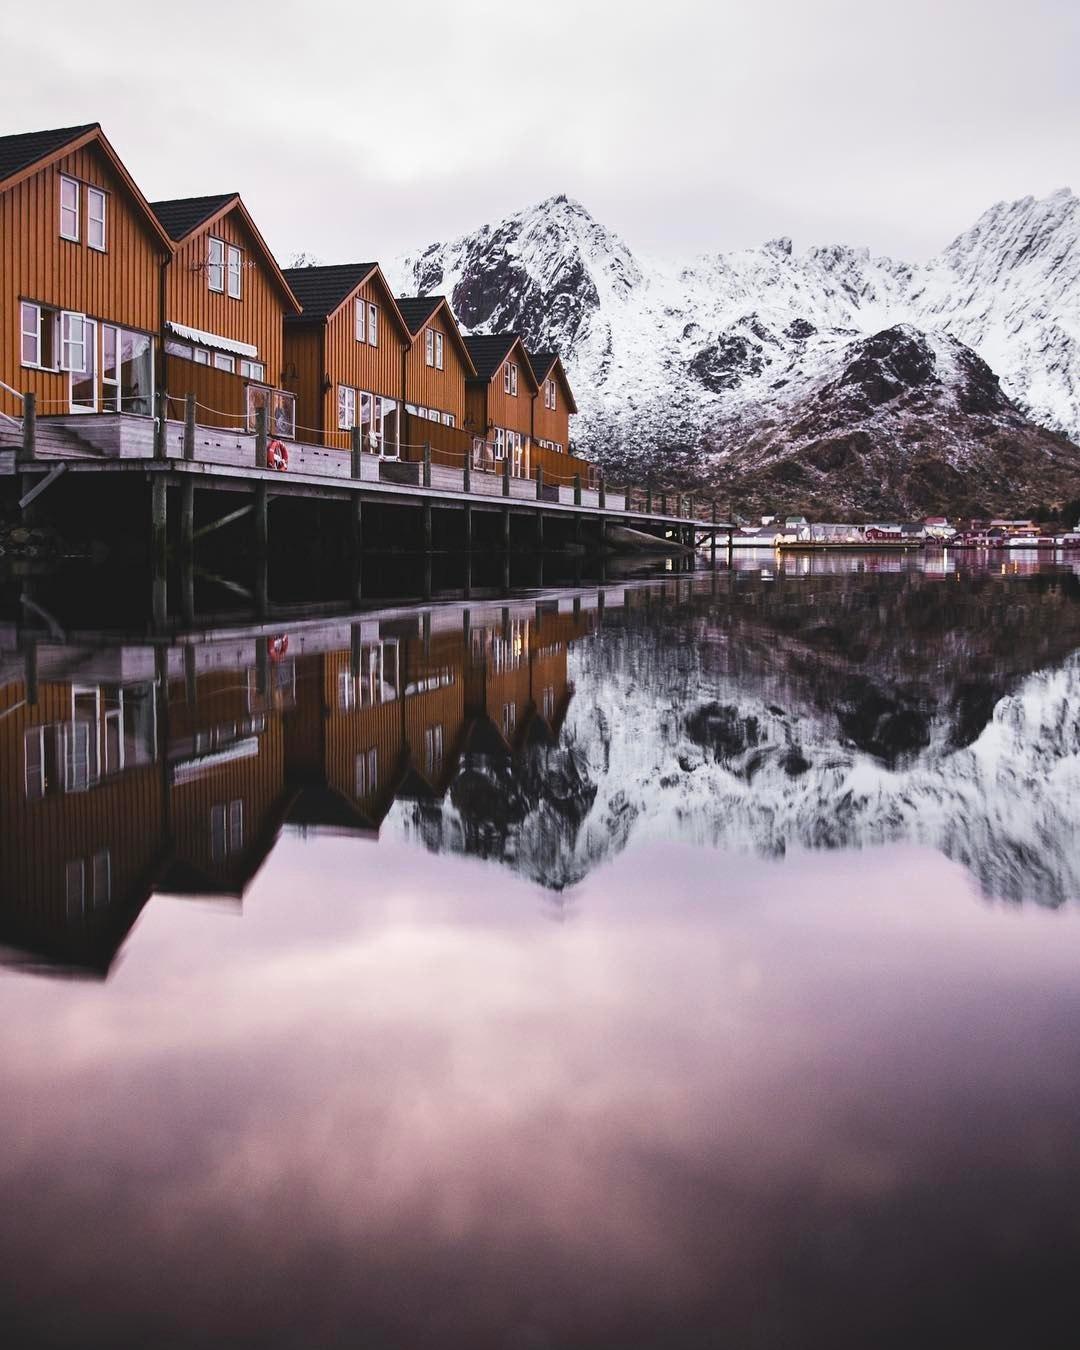 sw1A qTOENY - Норвегия - страна холодной красоты